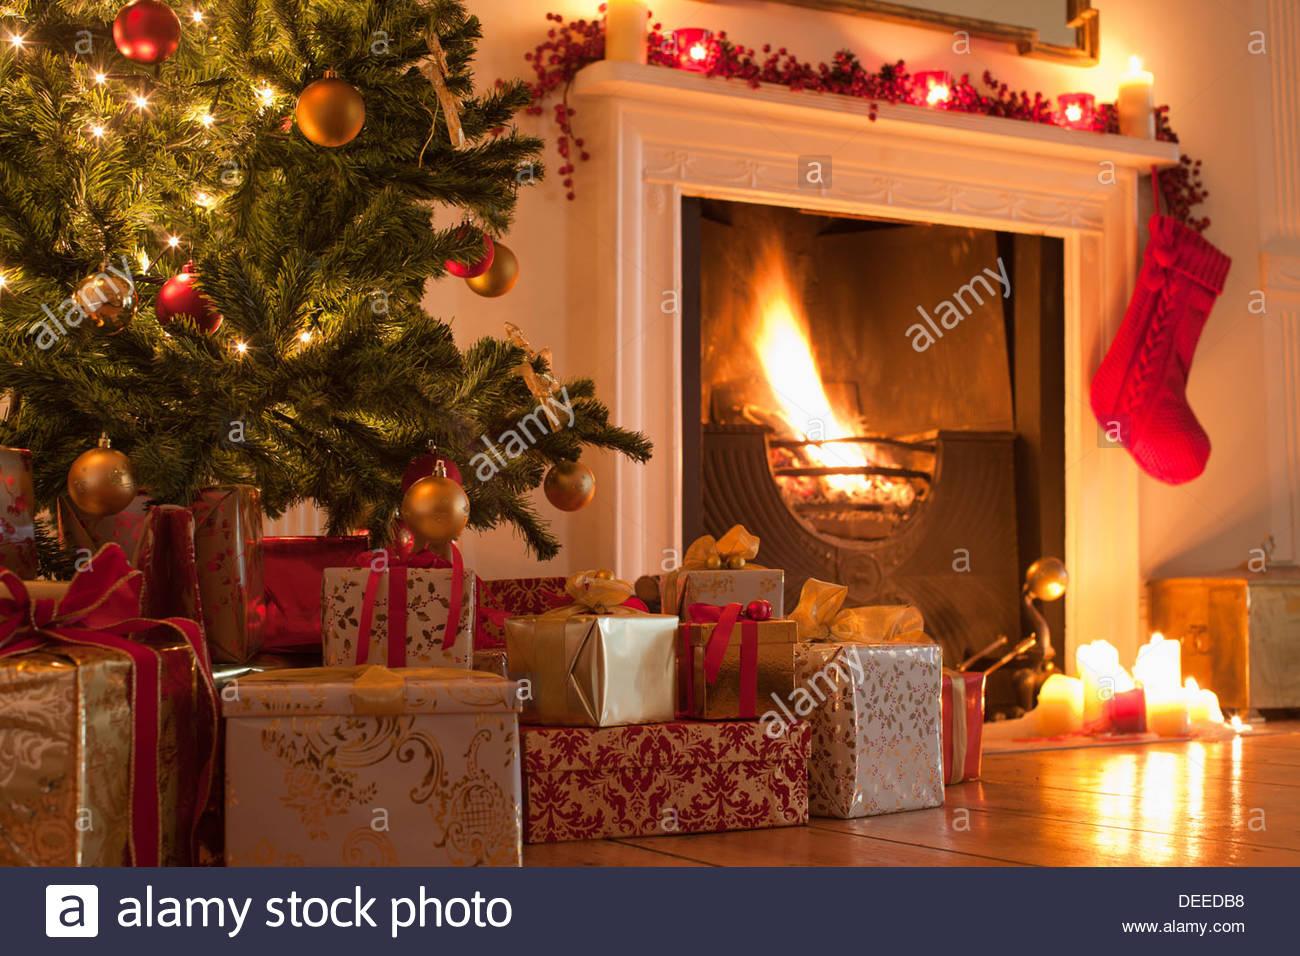 Christmas tree and stocking near fireplace - Stock Image